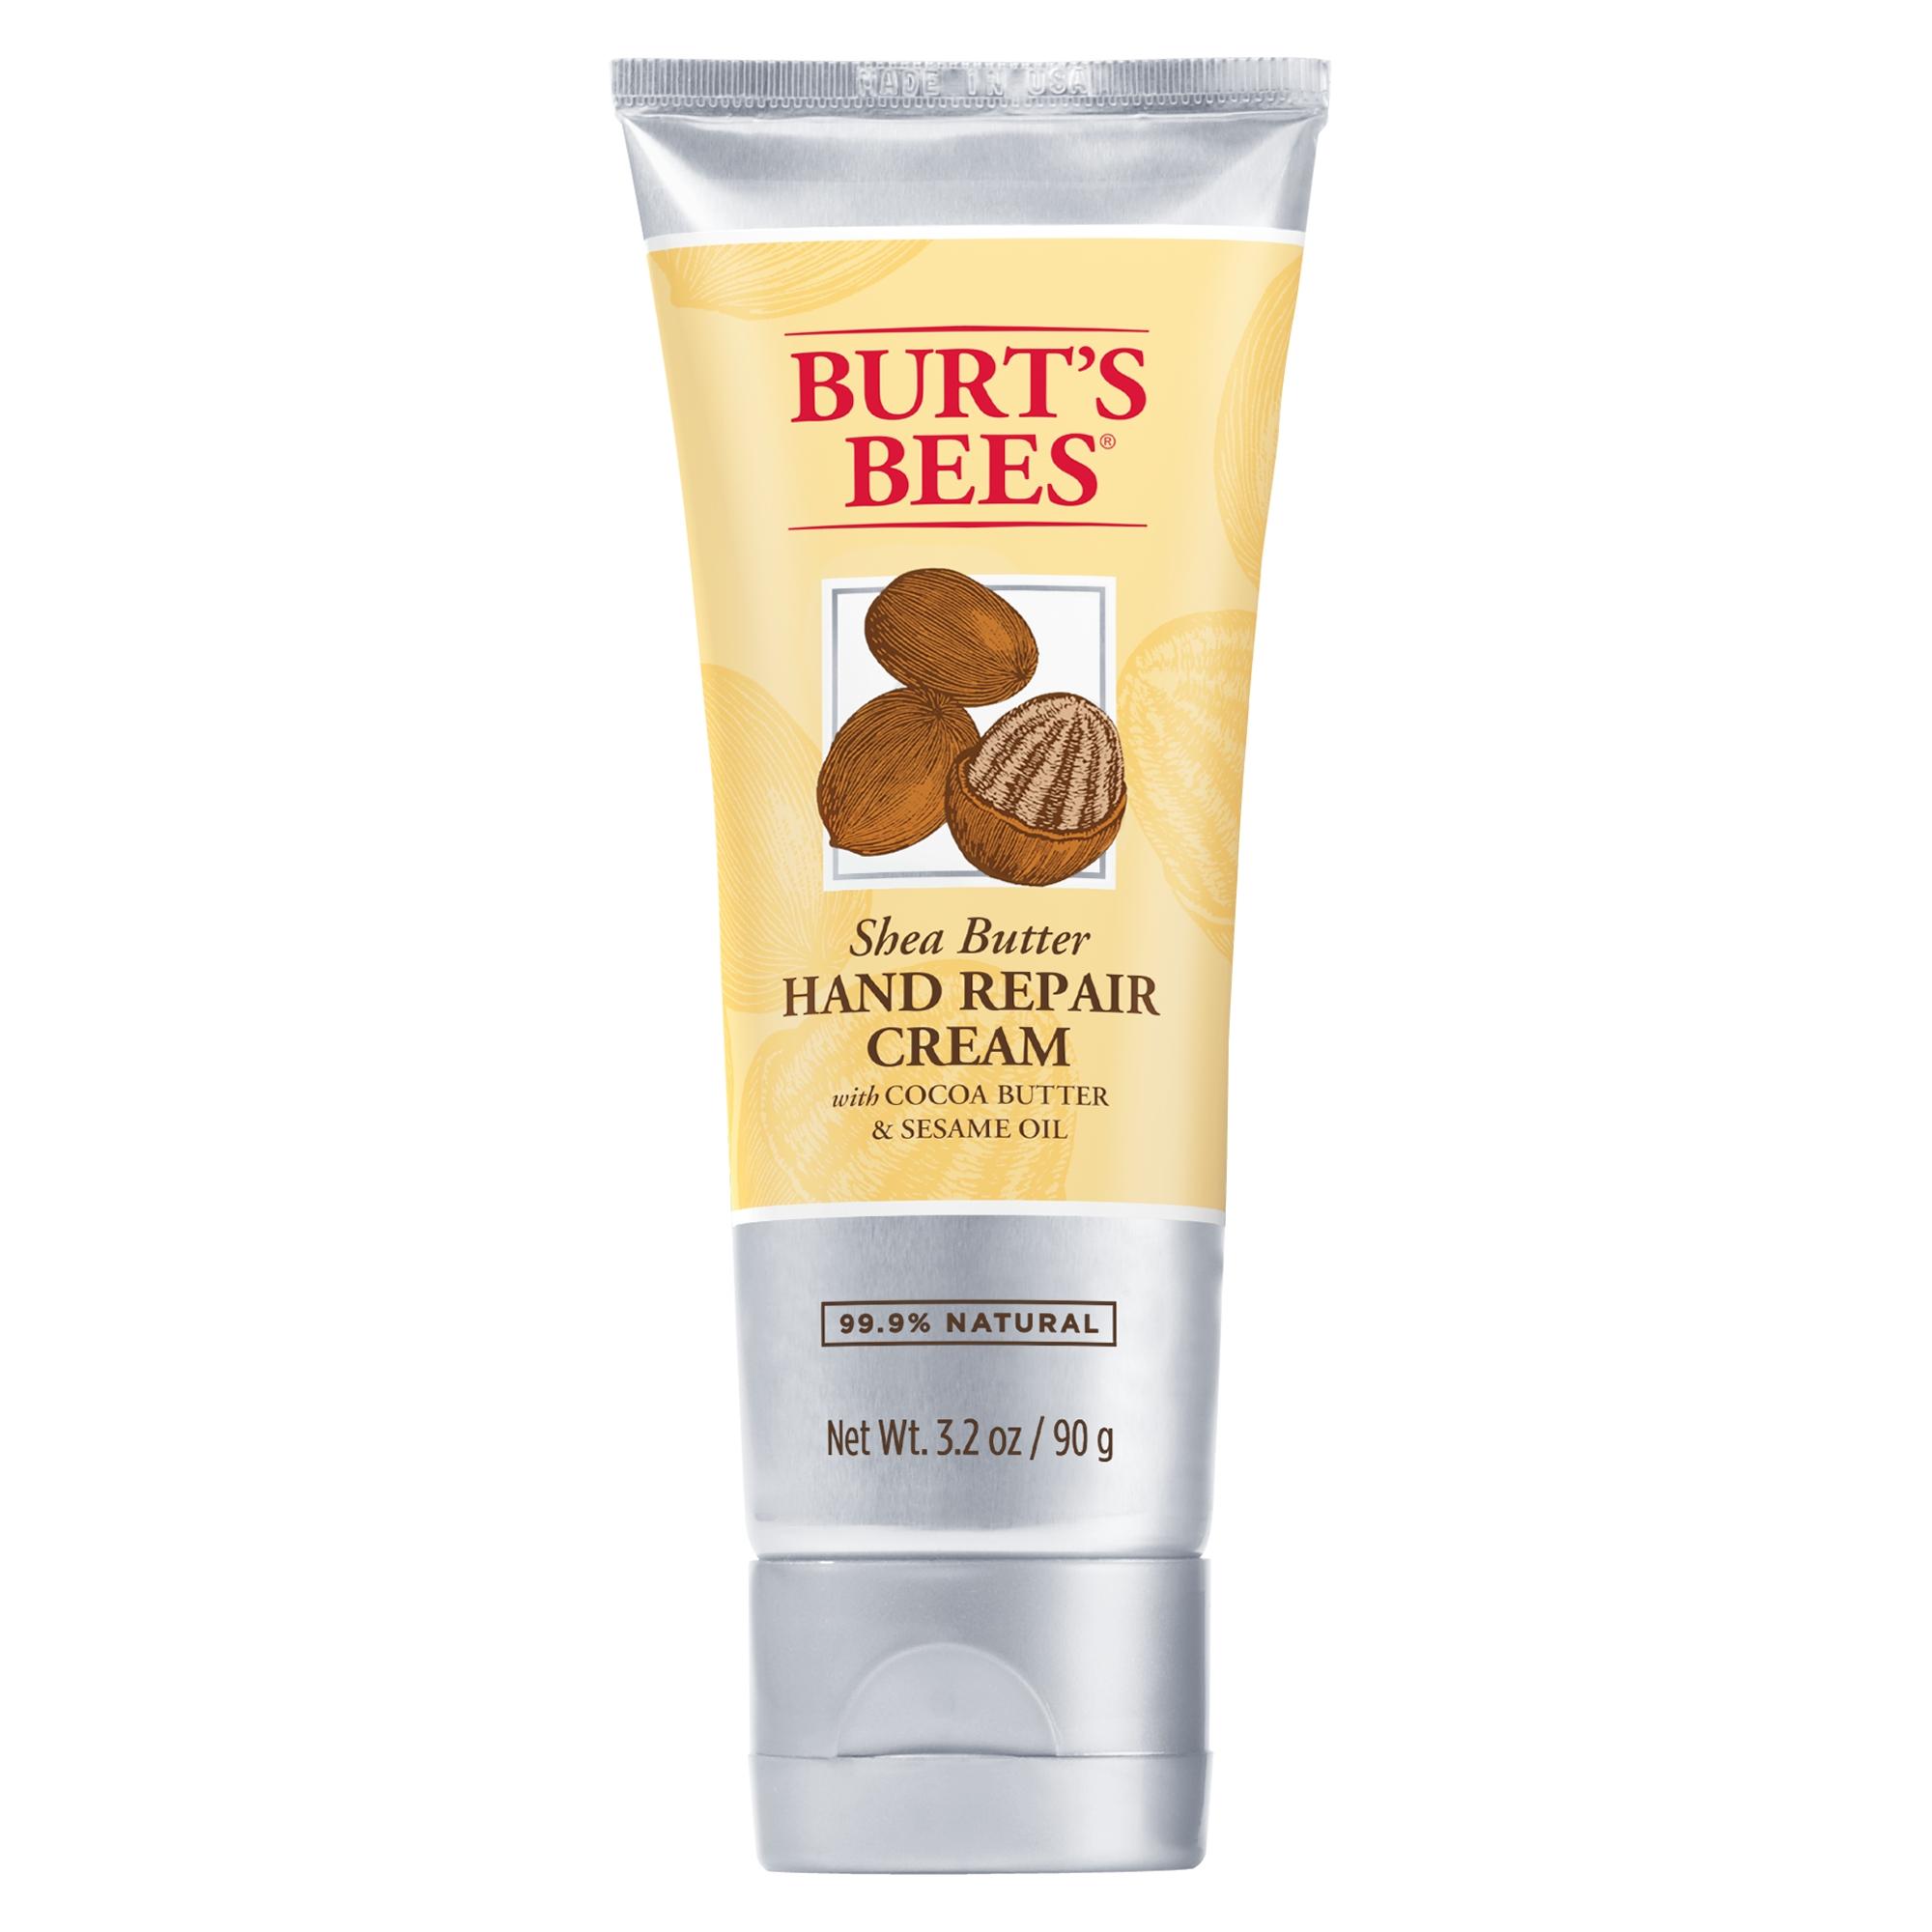 Burt's Bees Shea Butter Hand Repair Cream - 3.2 oz Tube